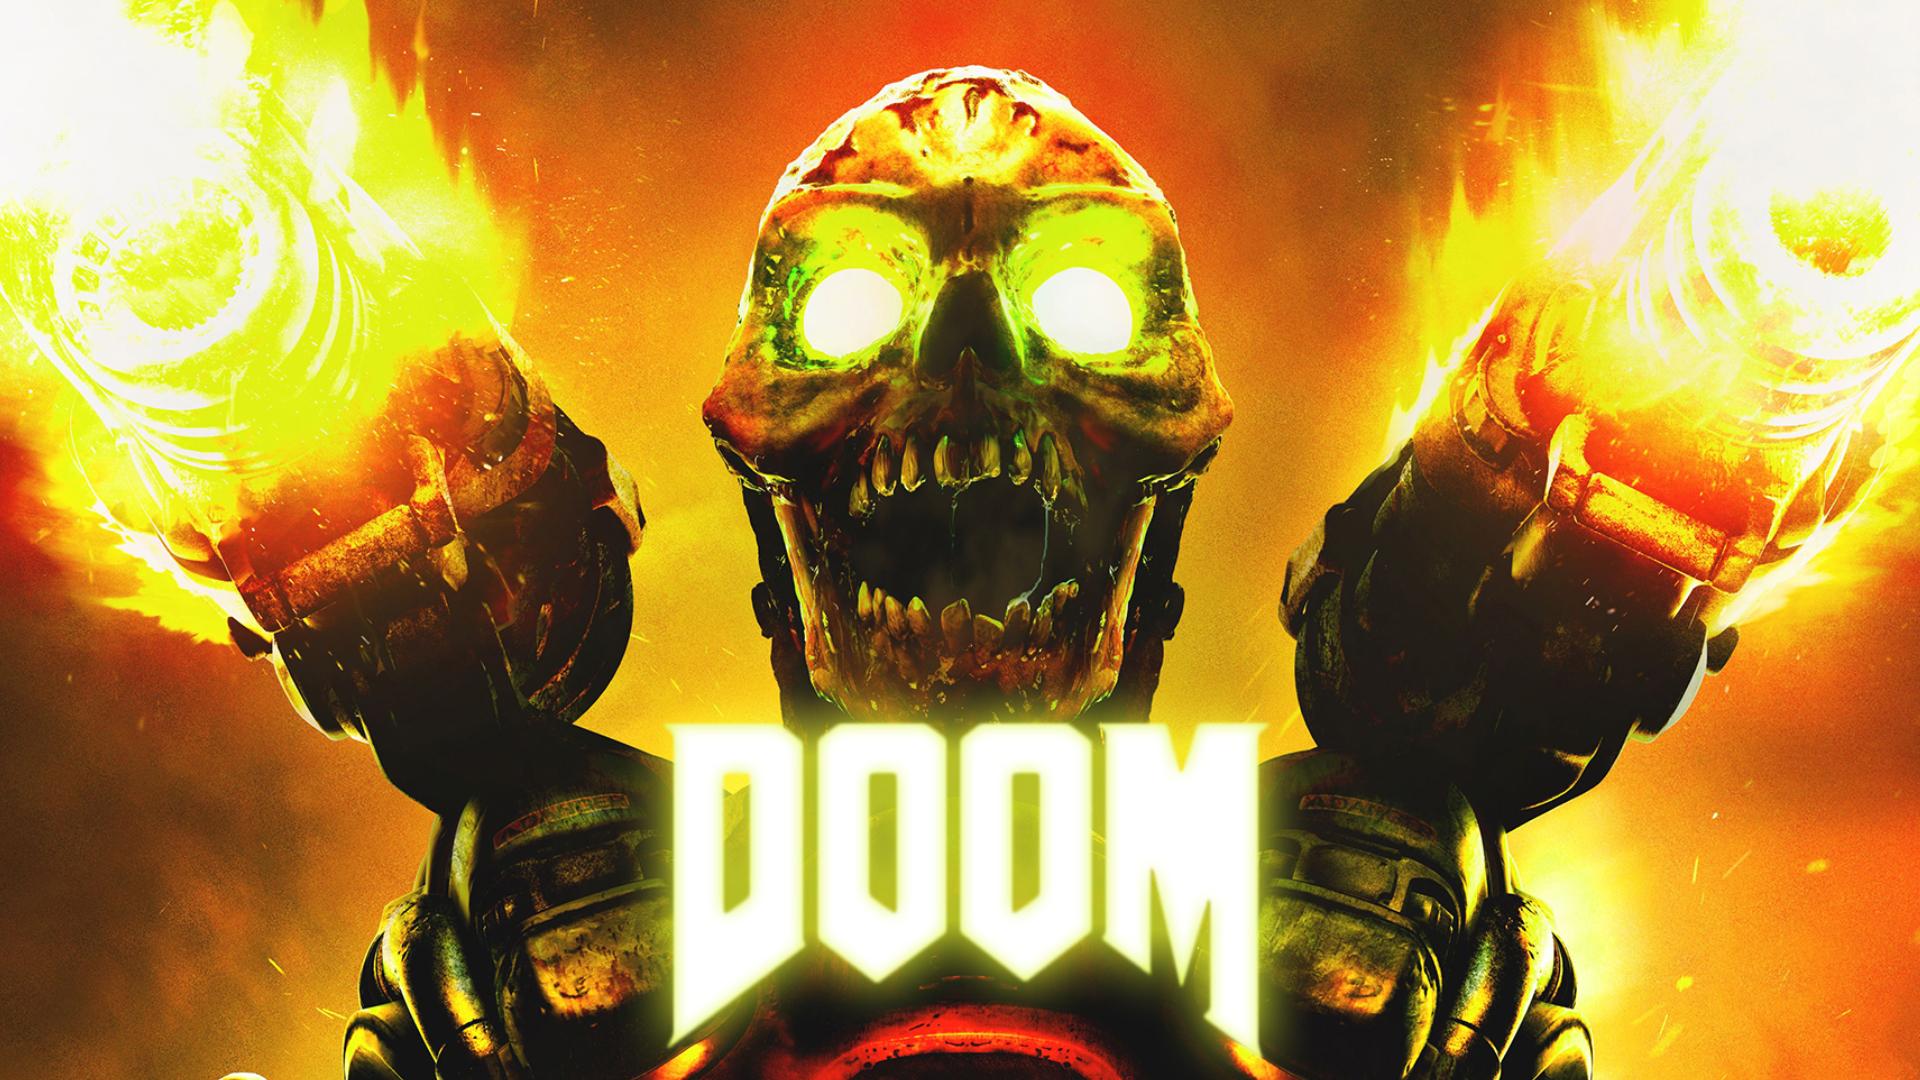 Doom 4K Wallpaper Doom 1080p Wallpaper Doom 720p Wallpaper 1920x1080